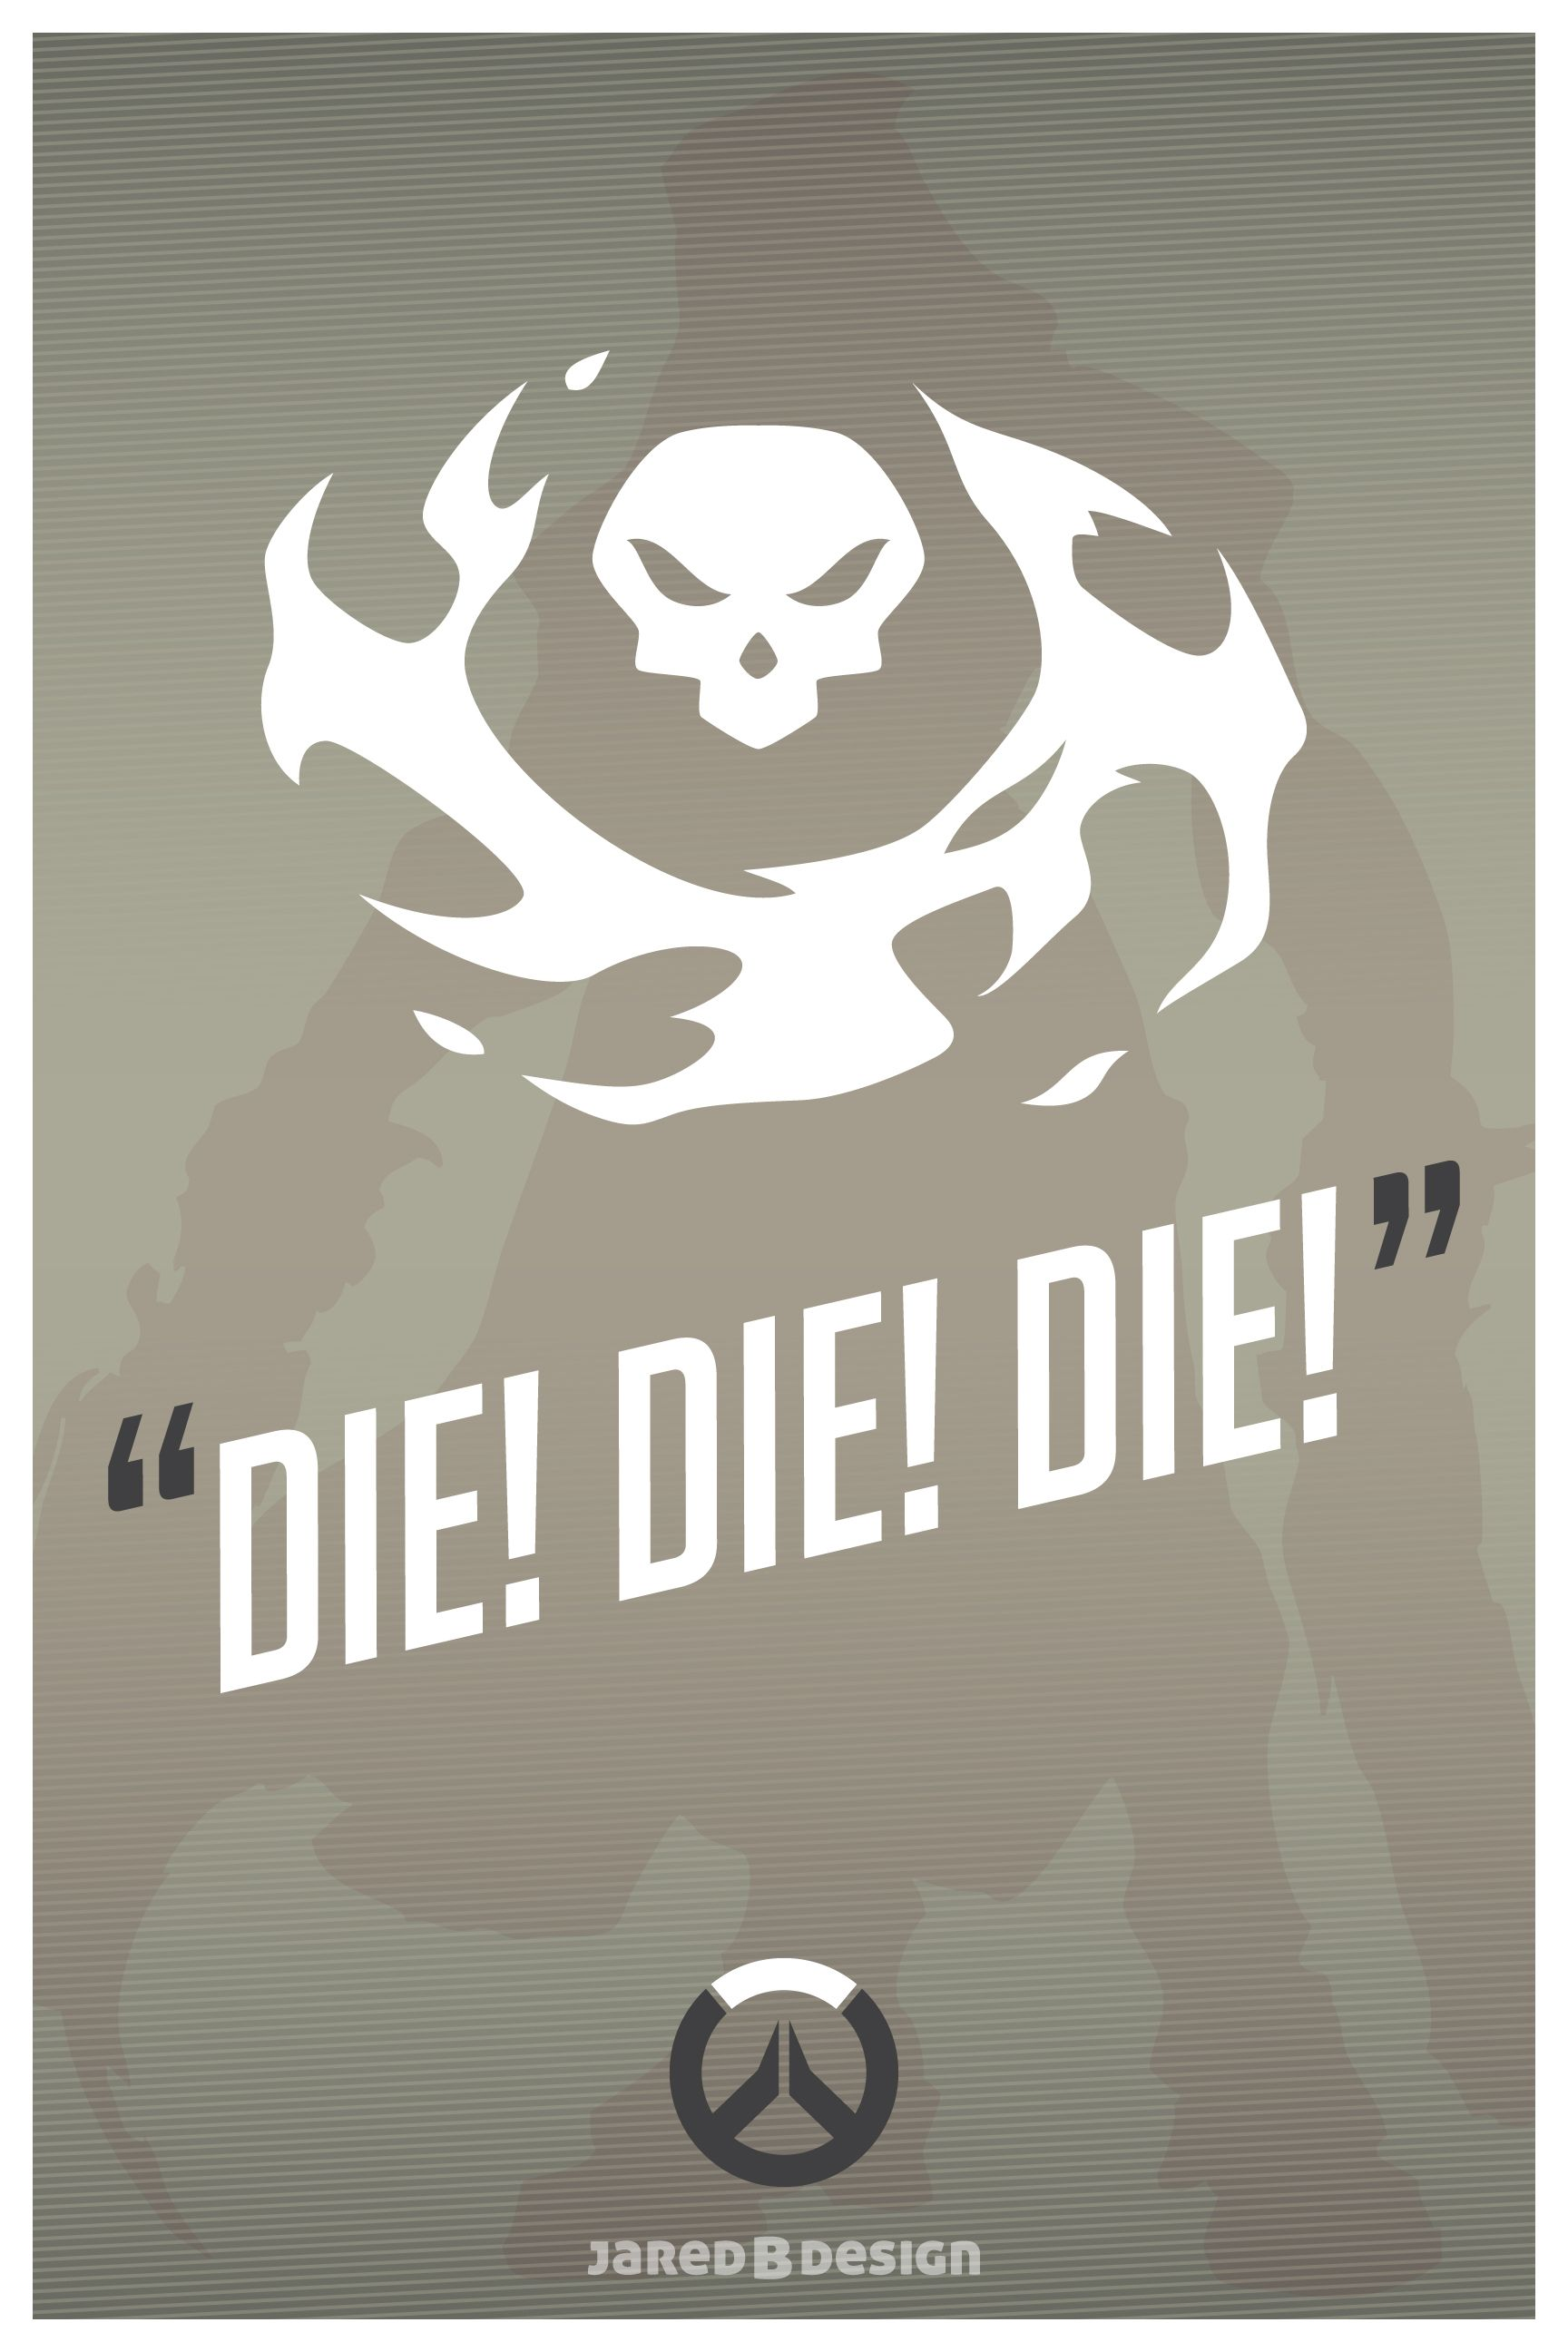 Genji Quotes Overwatch Phone Wallpaper Poster Dump Overwatch And Wallpaper